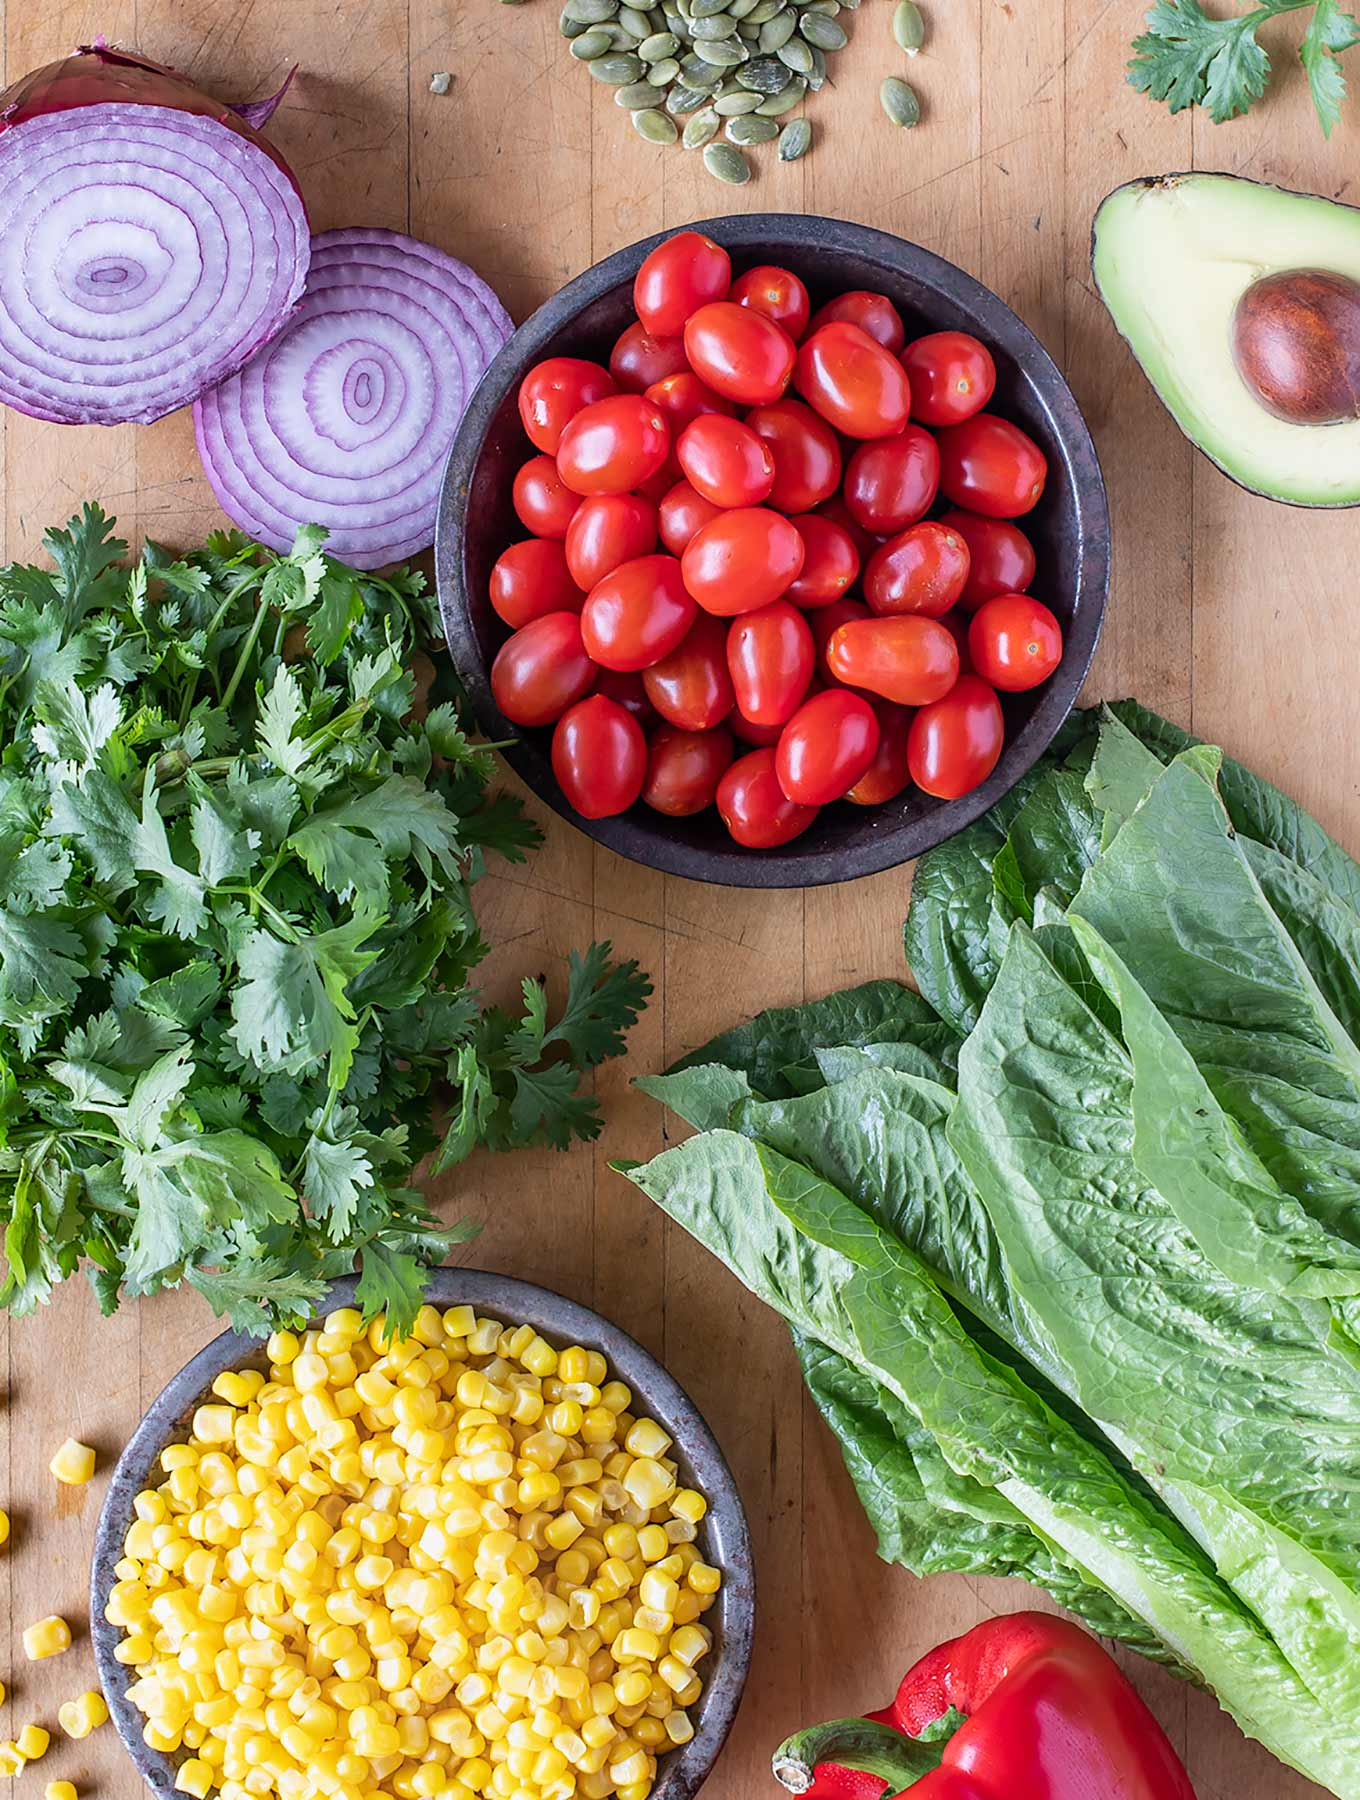 Assortment of fresh salad ingredients